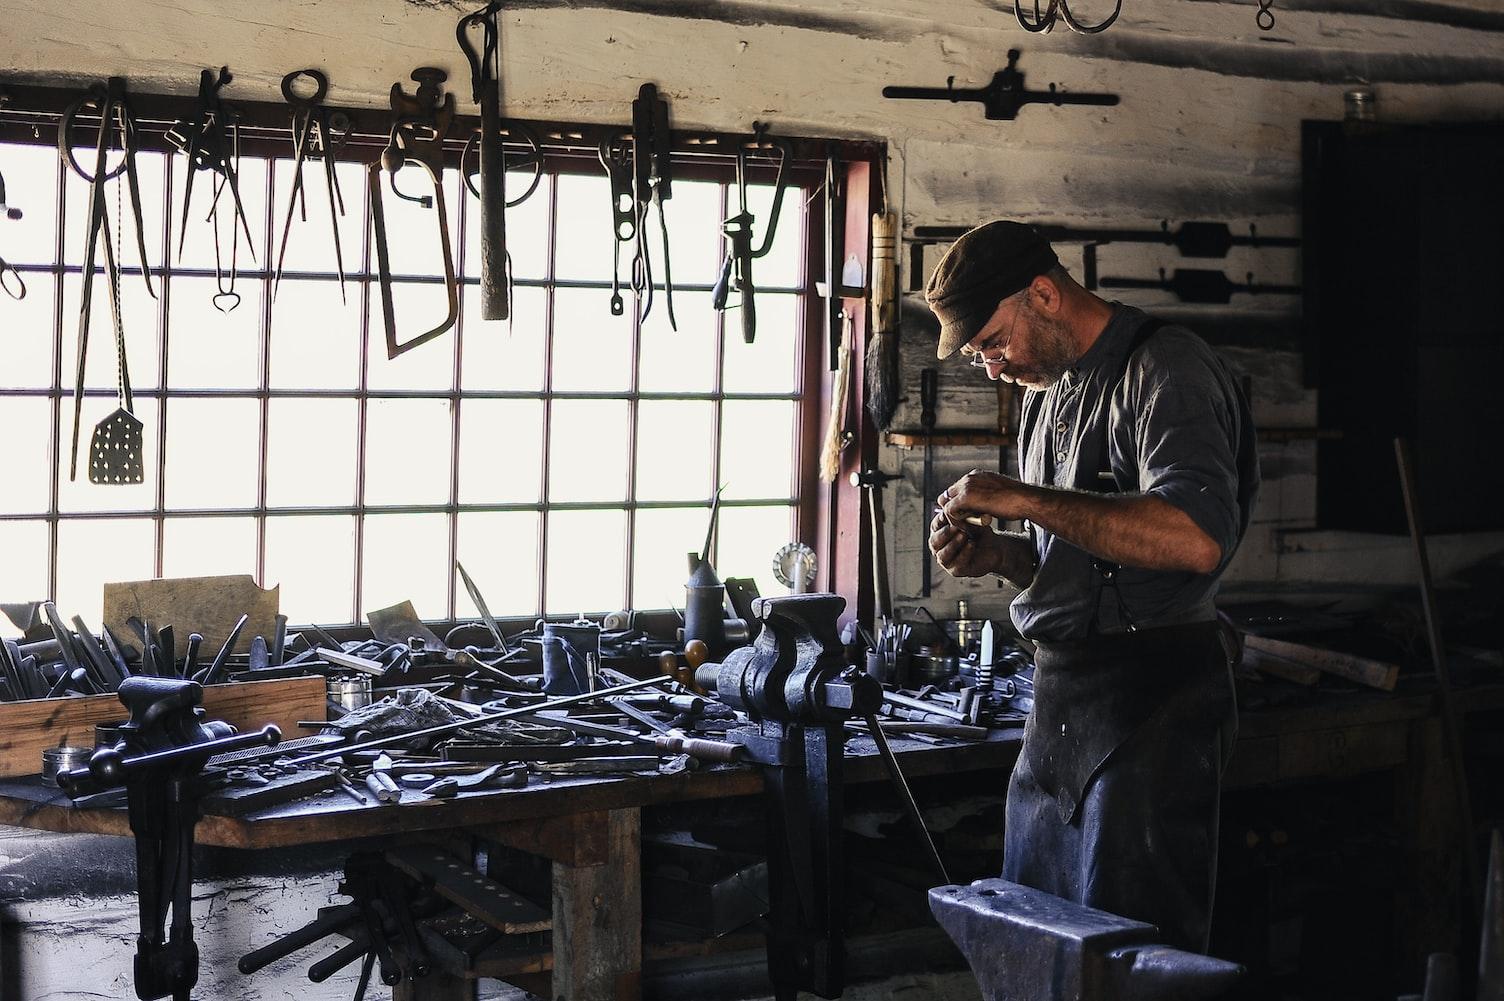 craftsman fromUnsplash